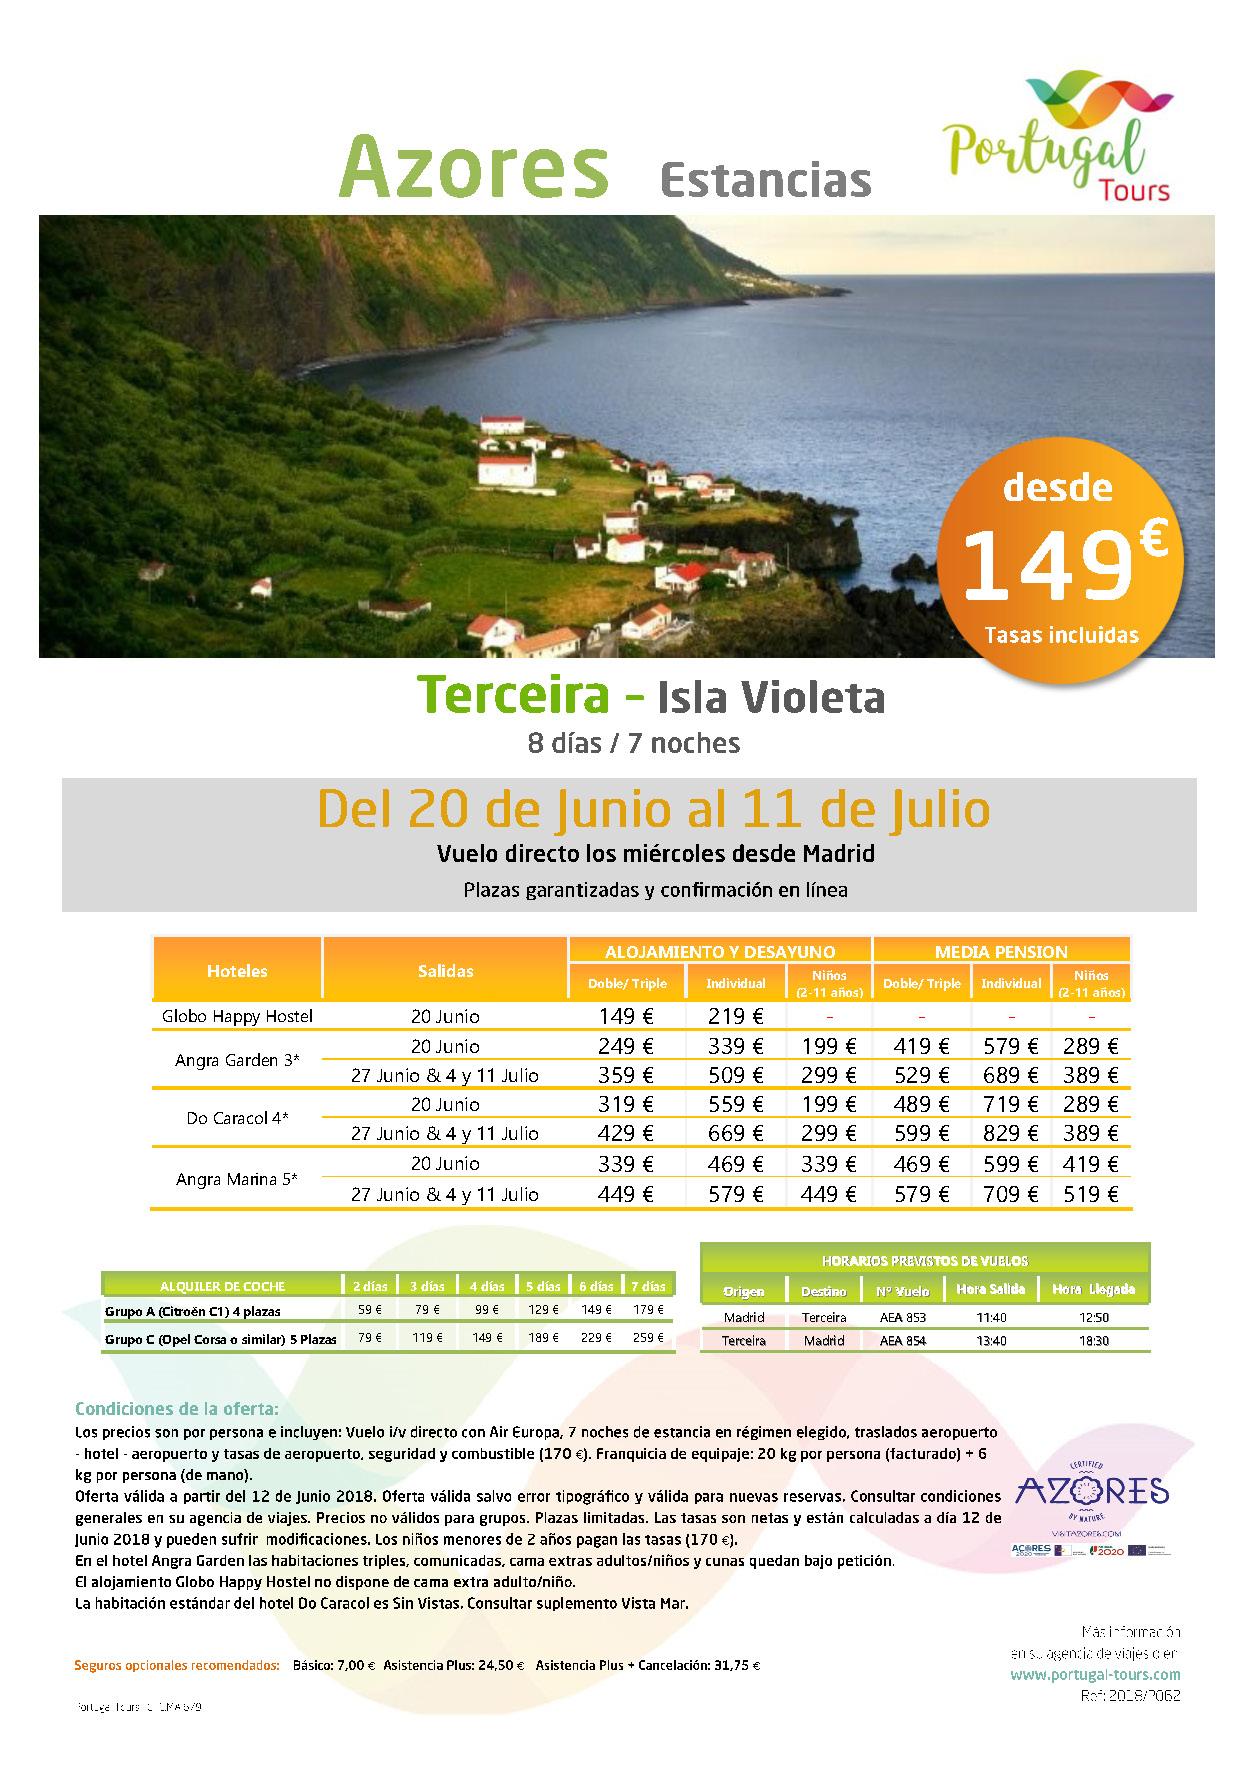 Oferta Portugal Tours Azores junio-julio 2018